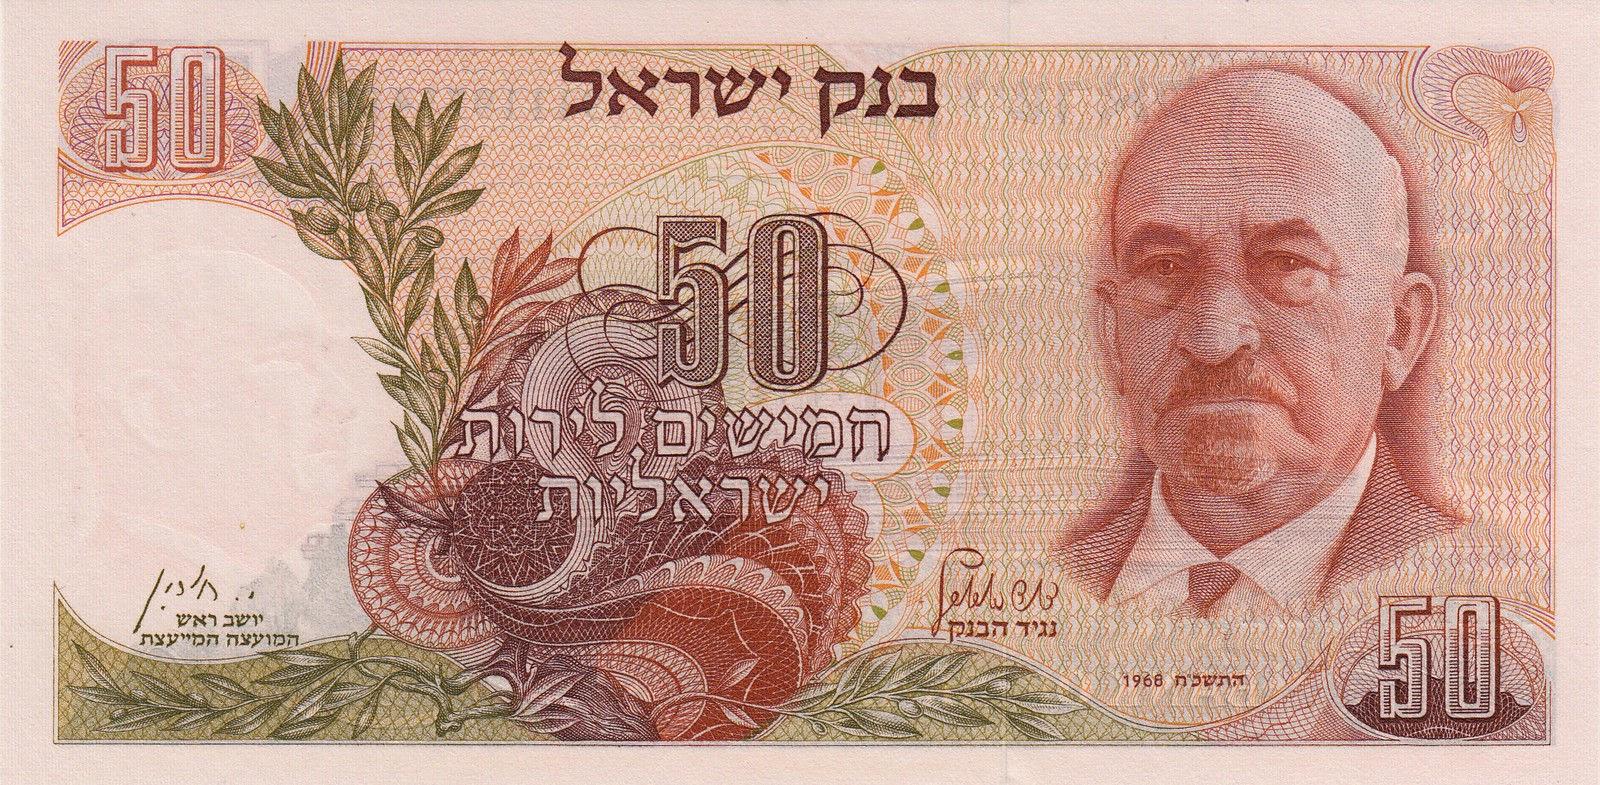 Israel Banknotes 50 Israeli Pounds 1968 Chaim Weizmann